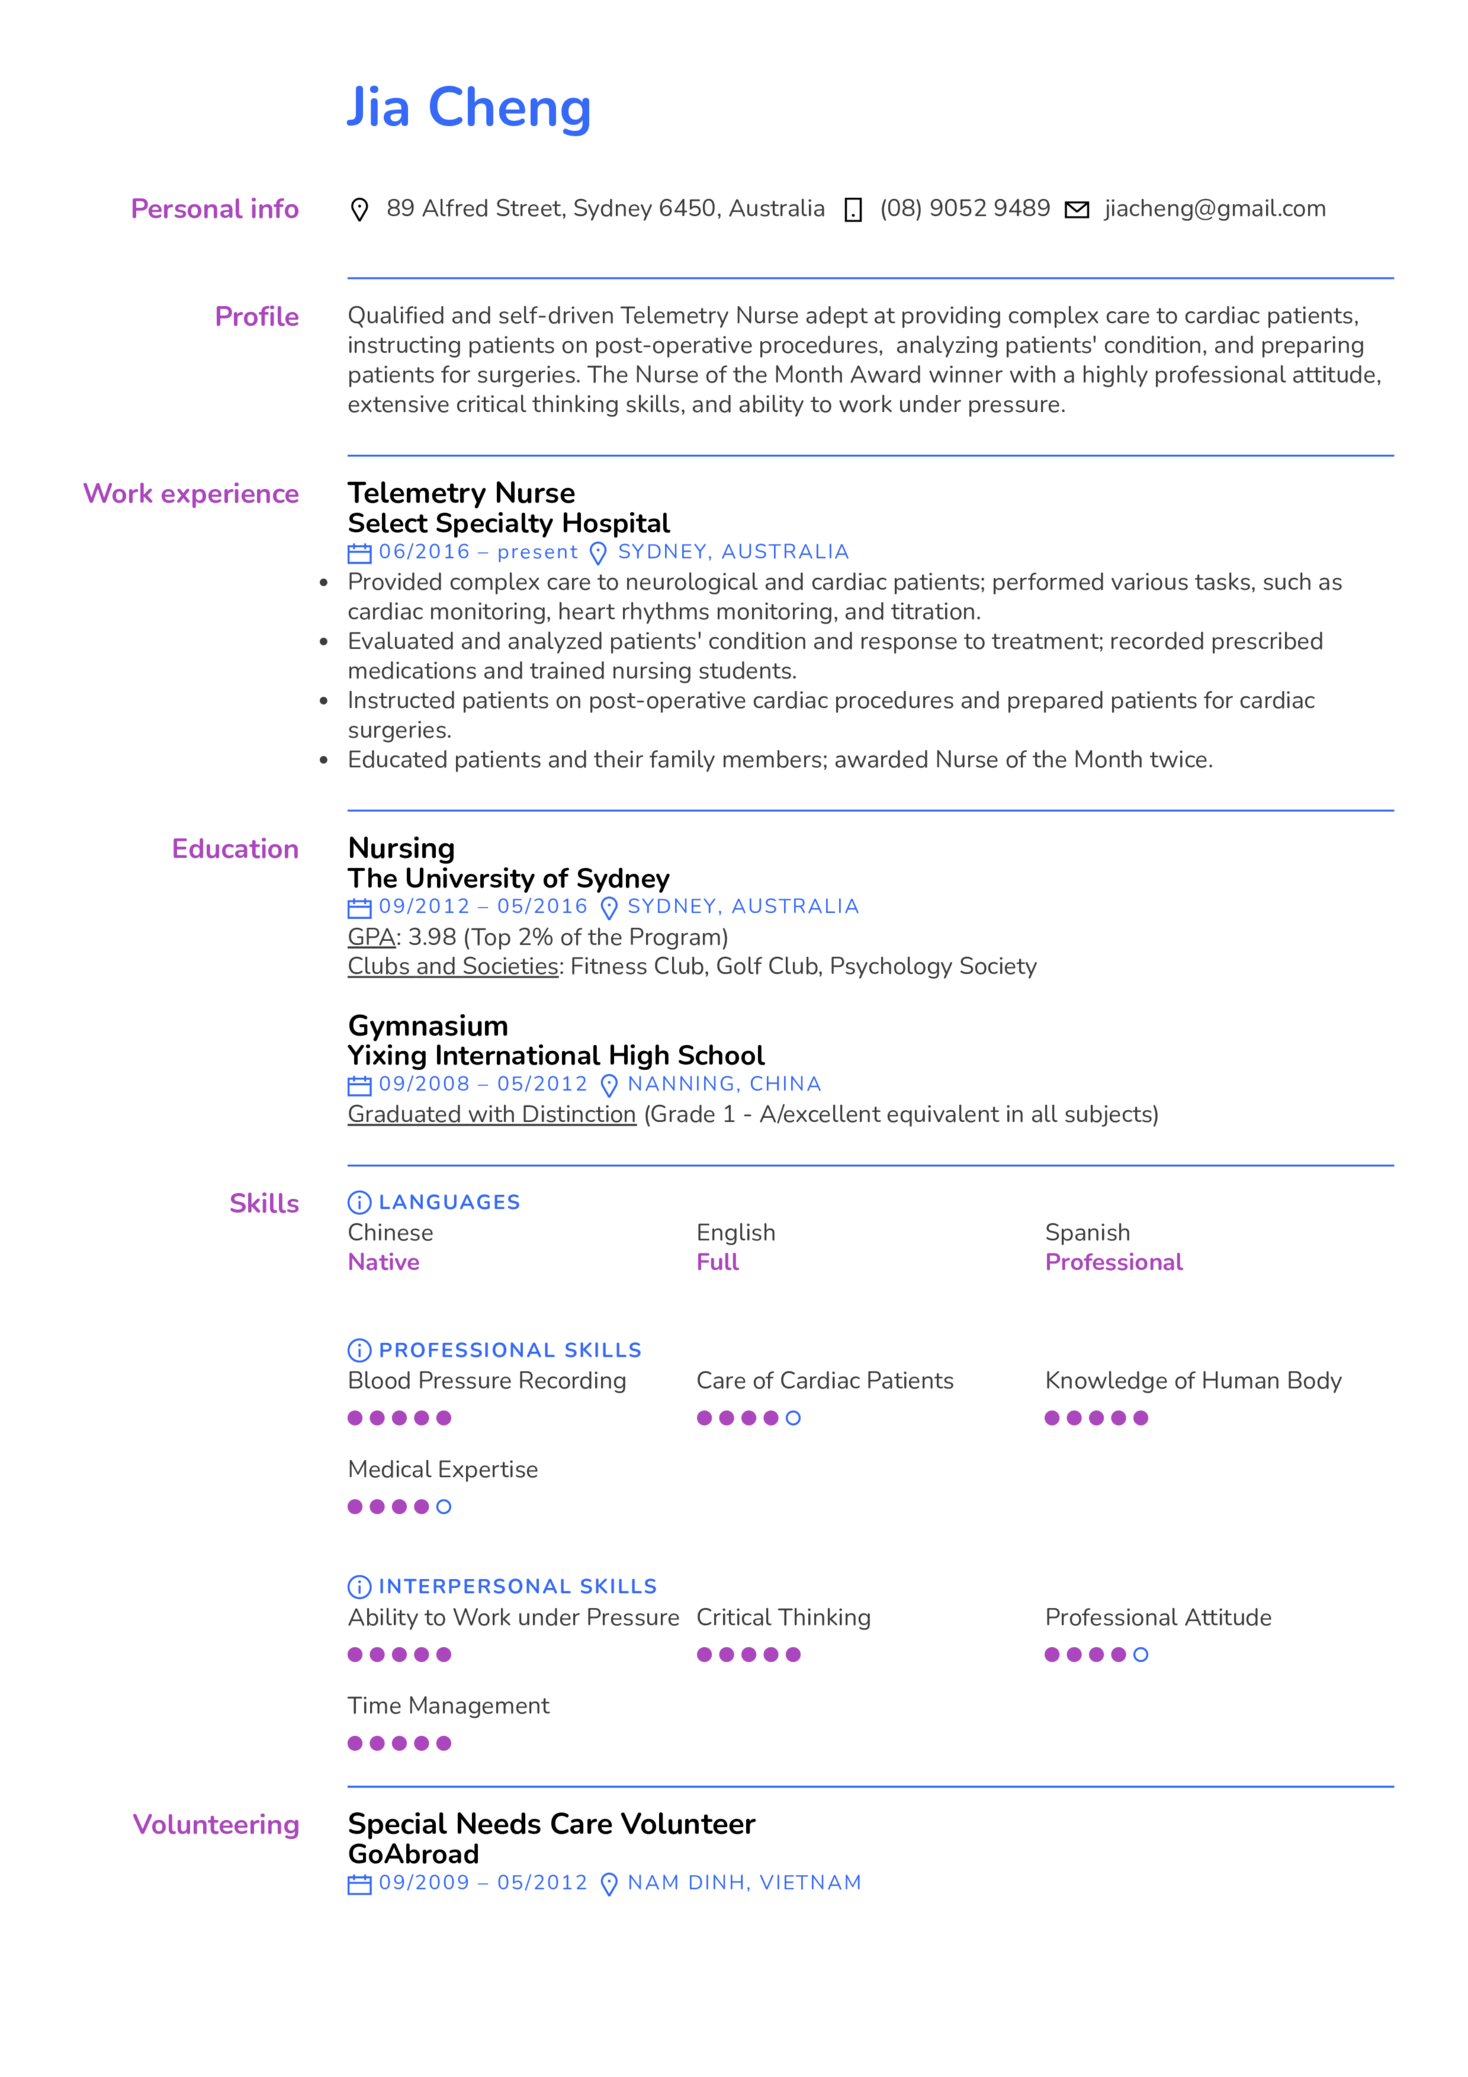 Telemetry Nurse Resume Example (Part 1)